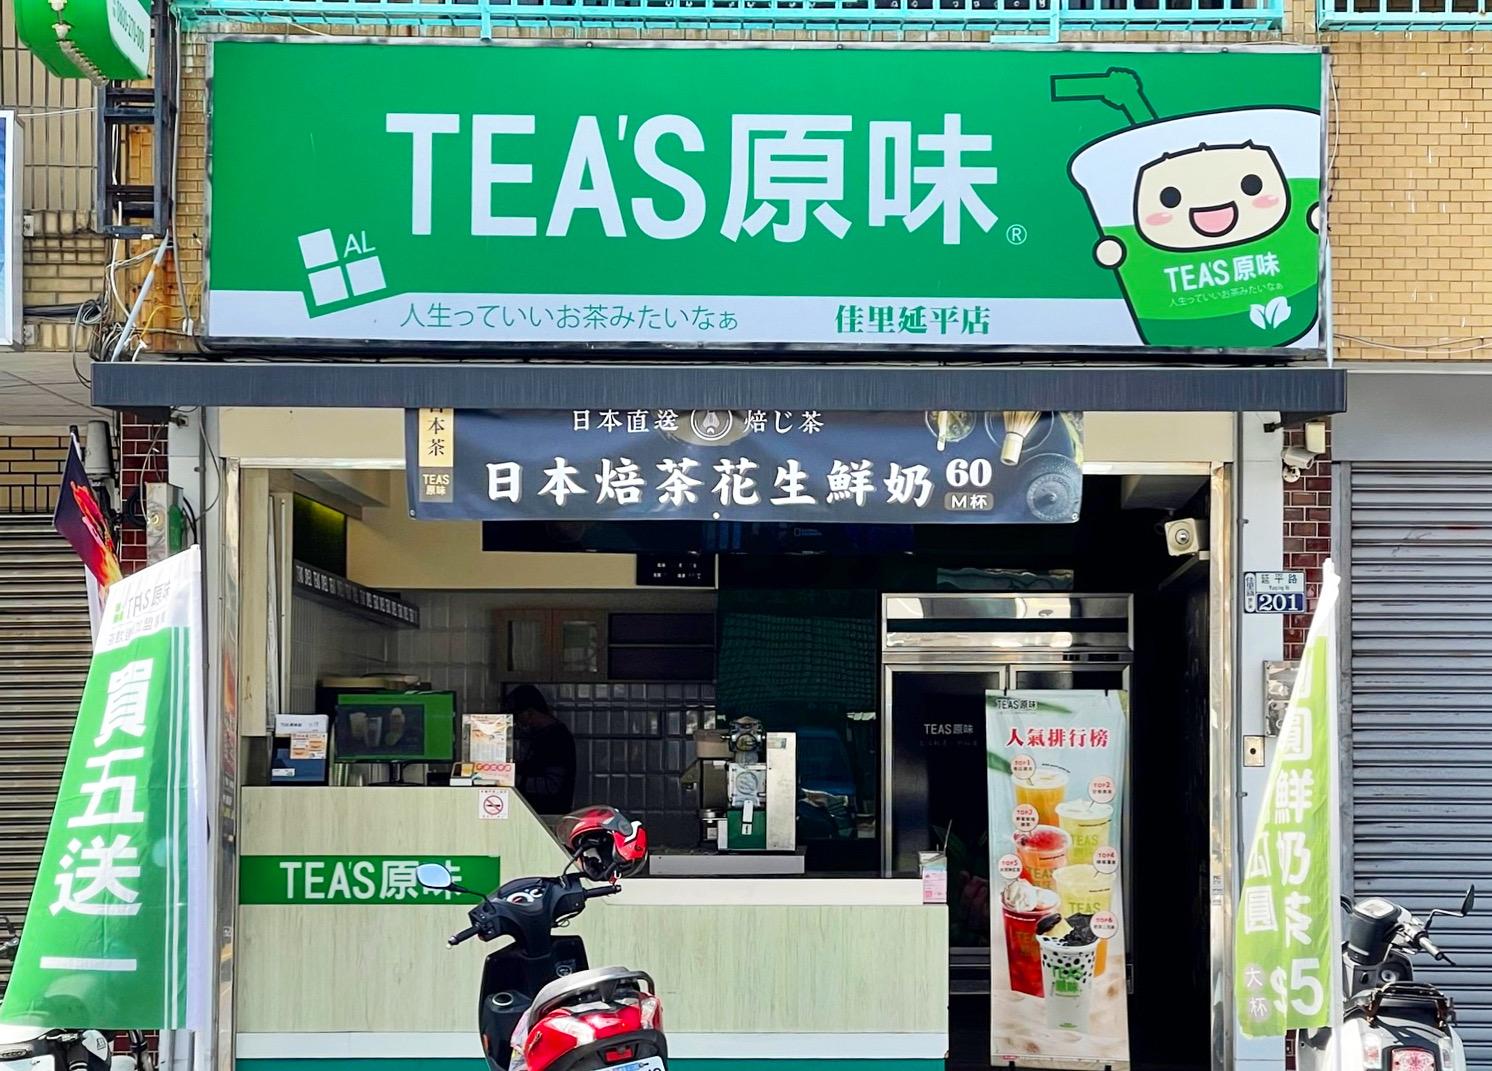 TEA'S原味的2021年菜單、優惠、最新品項和分店介紹(5月更新)